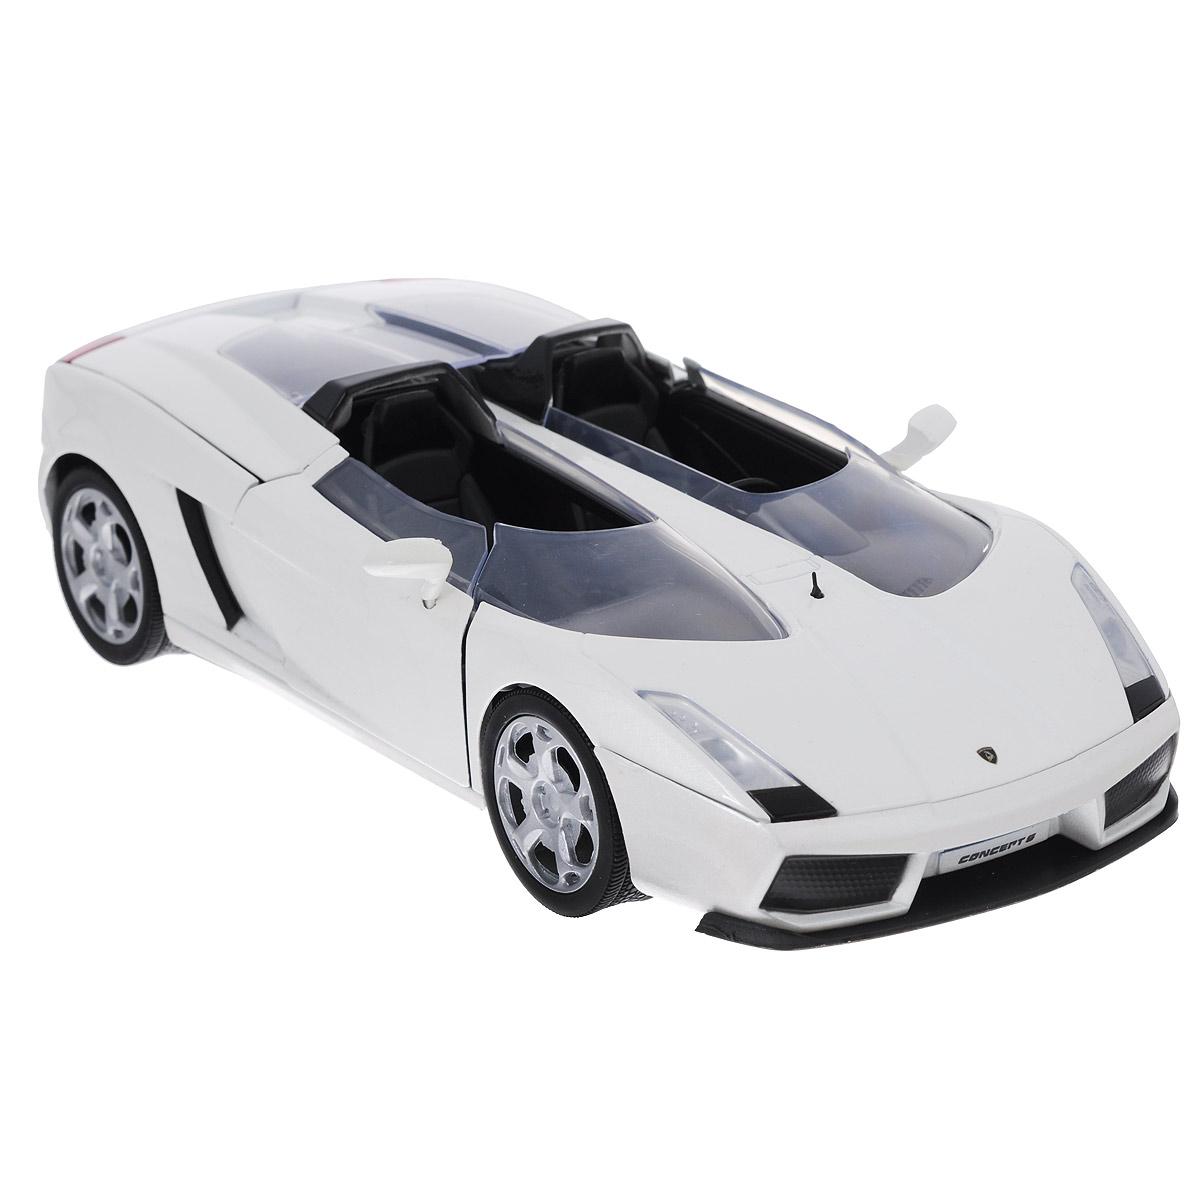 MotorMax Модель автомобиля Lamborghini Concept S motormax трансформирующийся в аэропорт